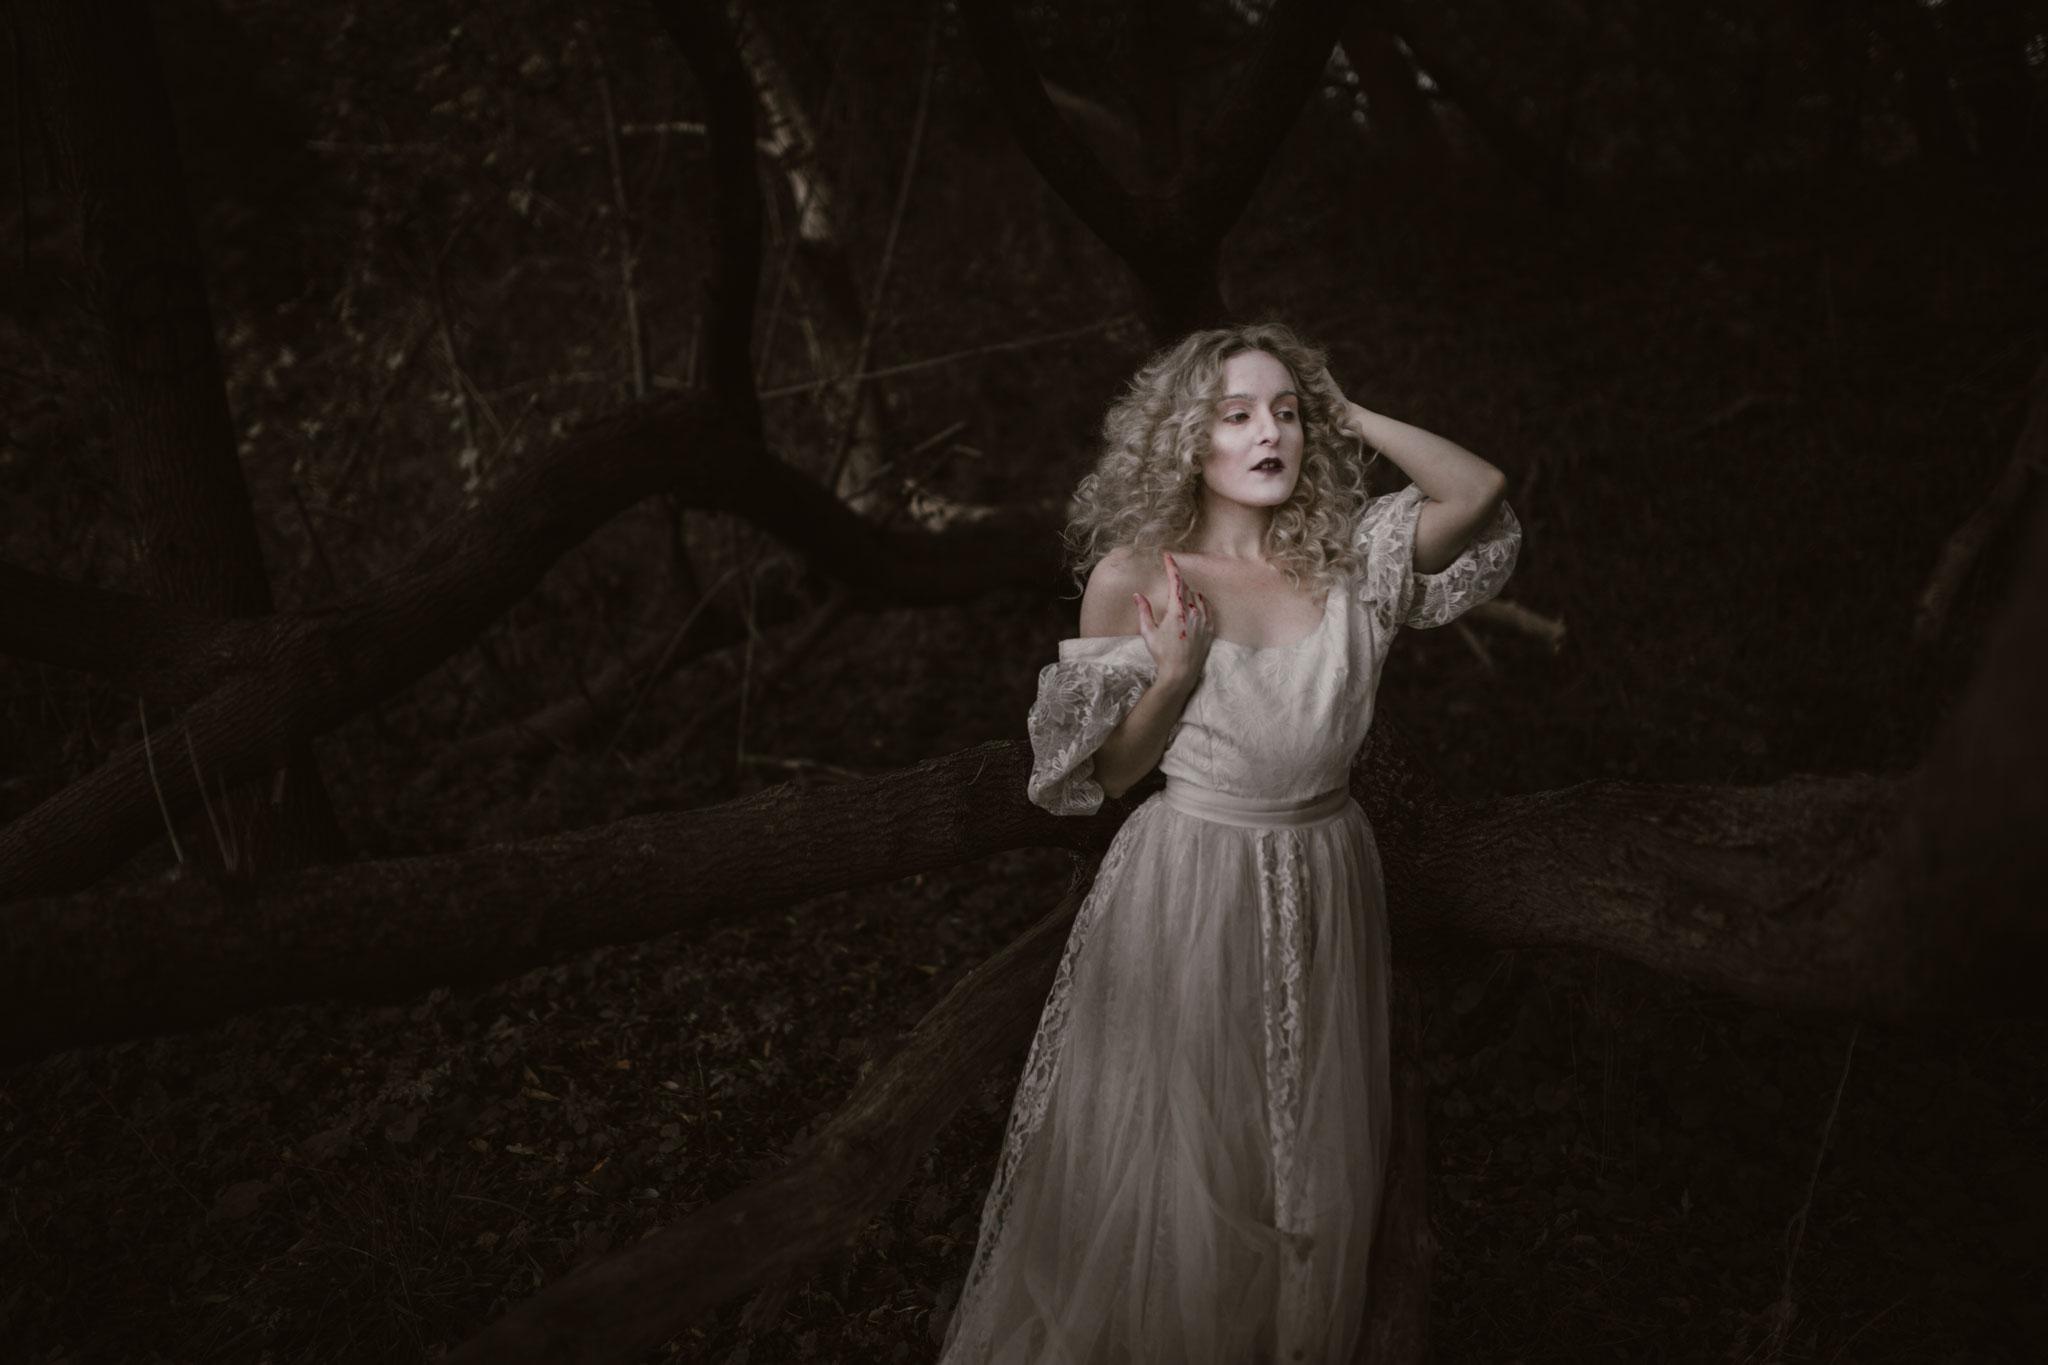 pale-witch-113fb.jpg